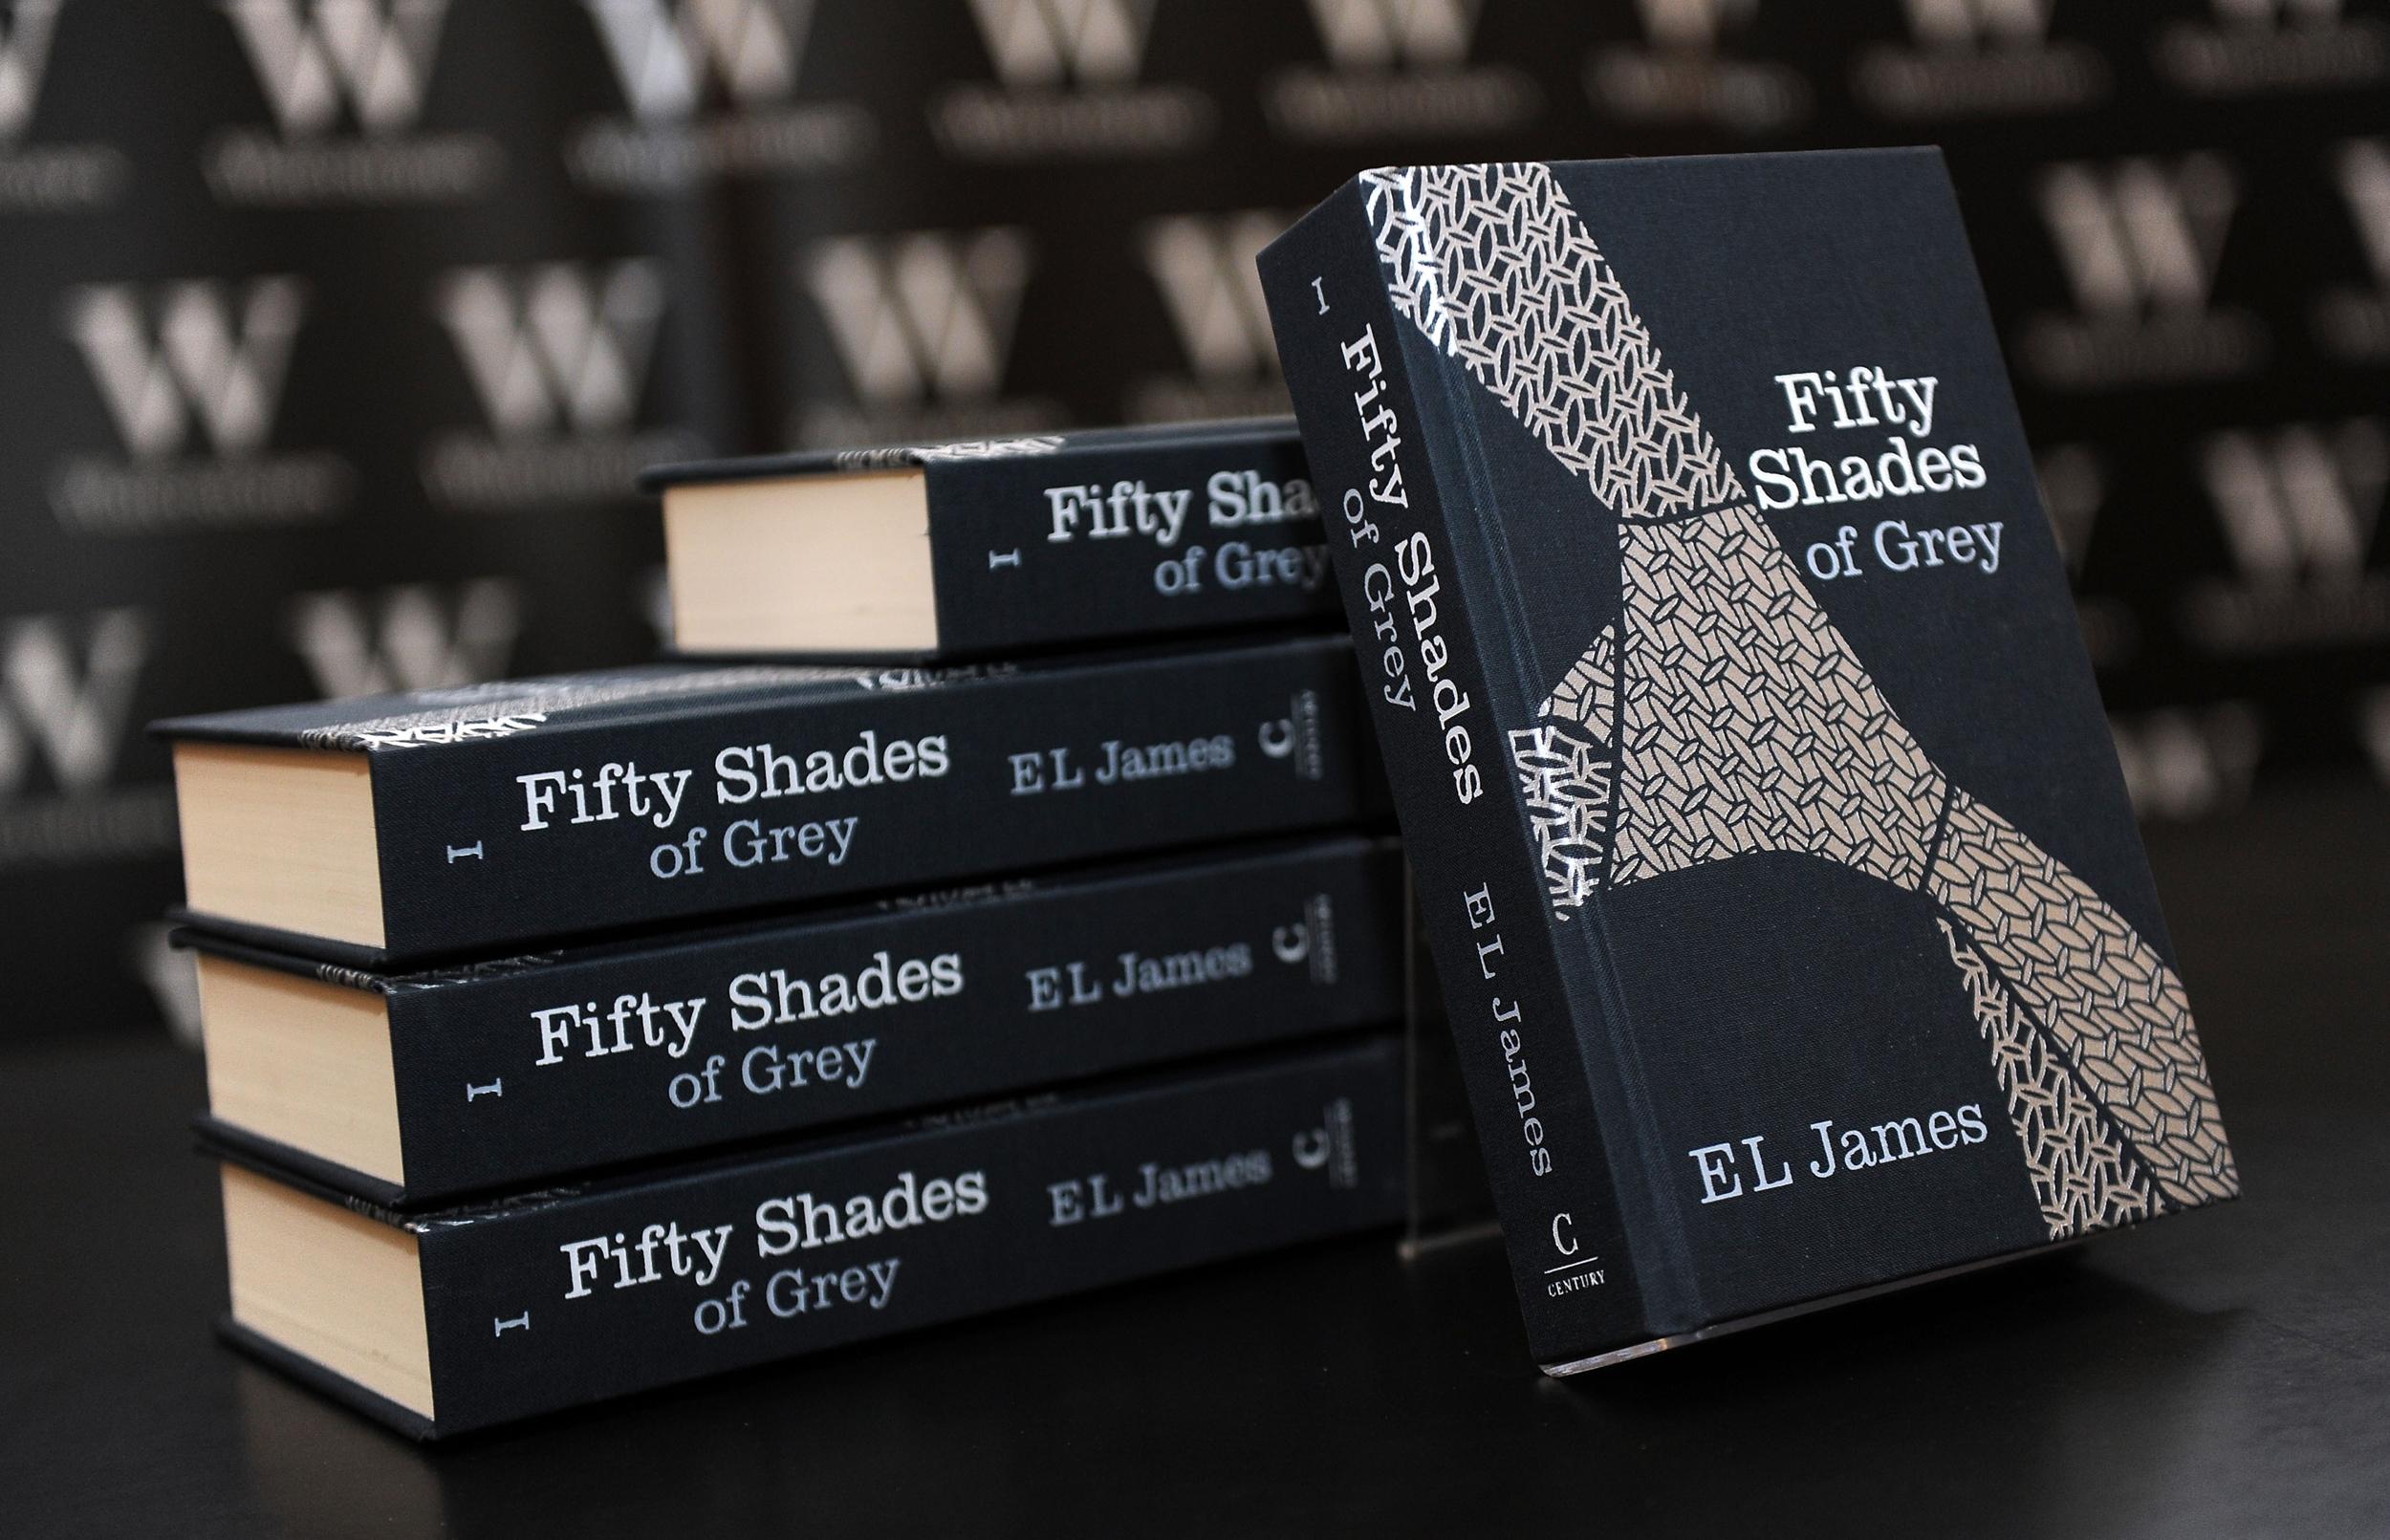 Grey schades of Fifty Shades